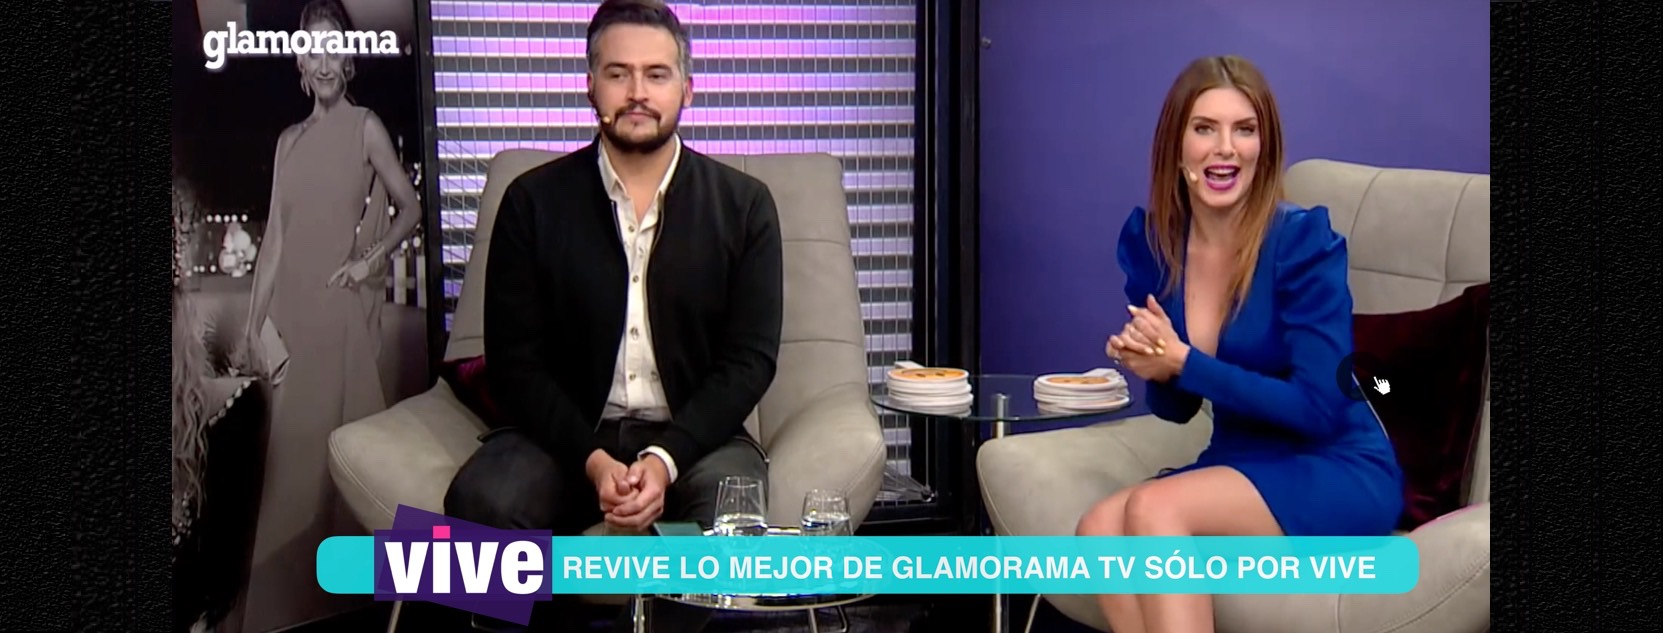 glamorama-tv1